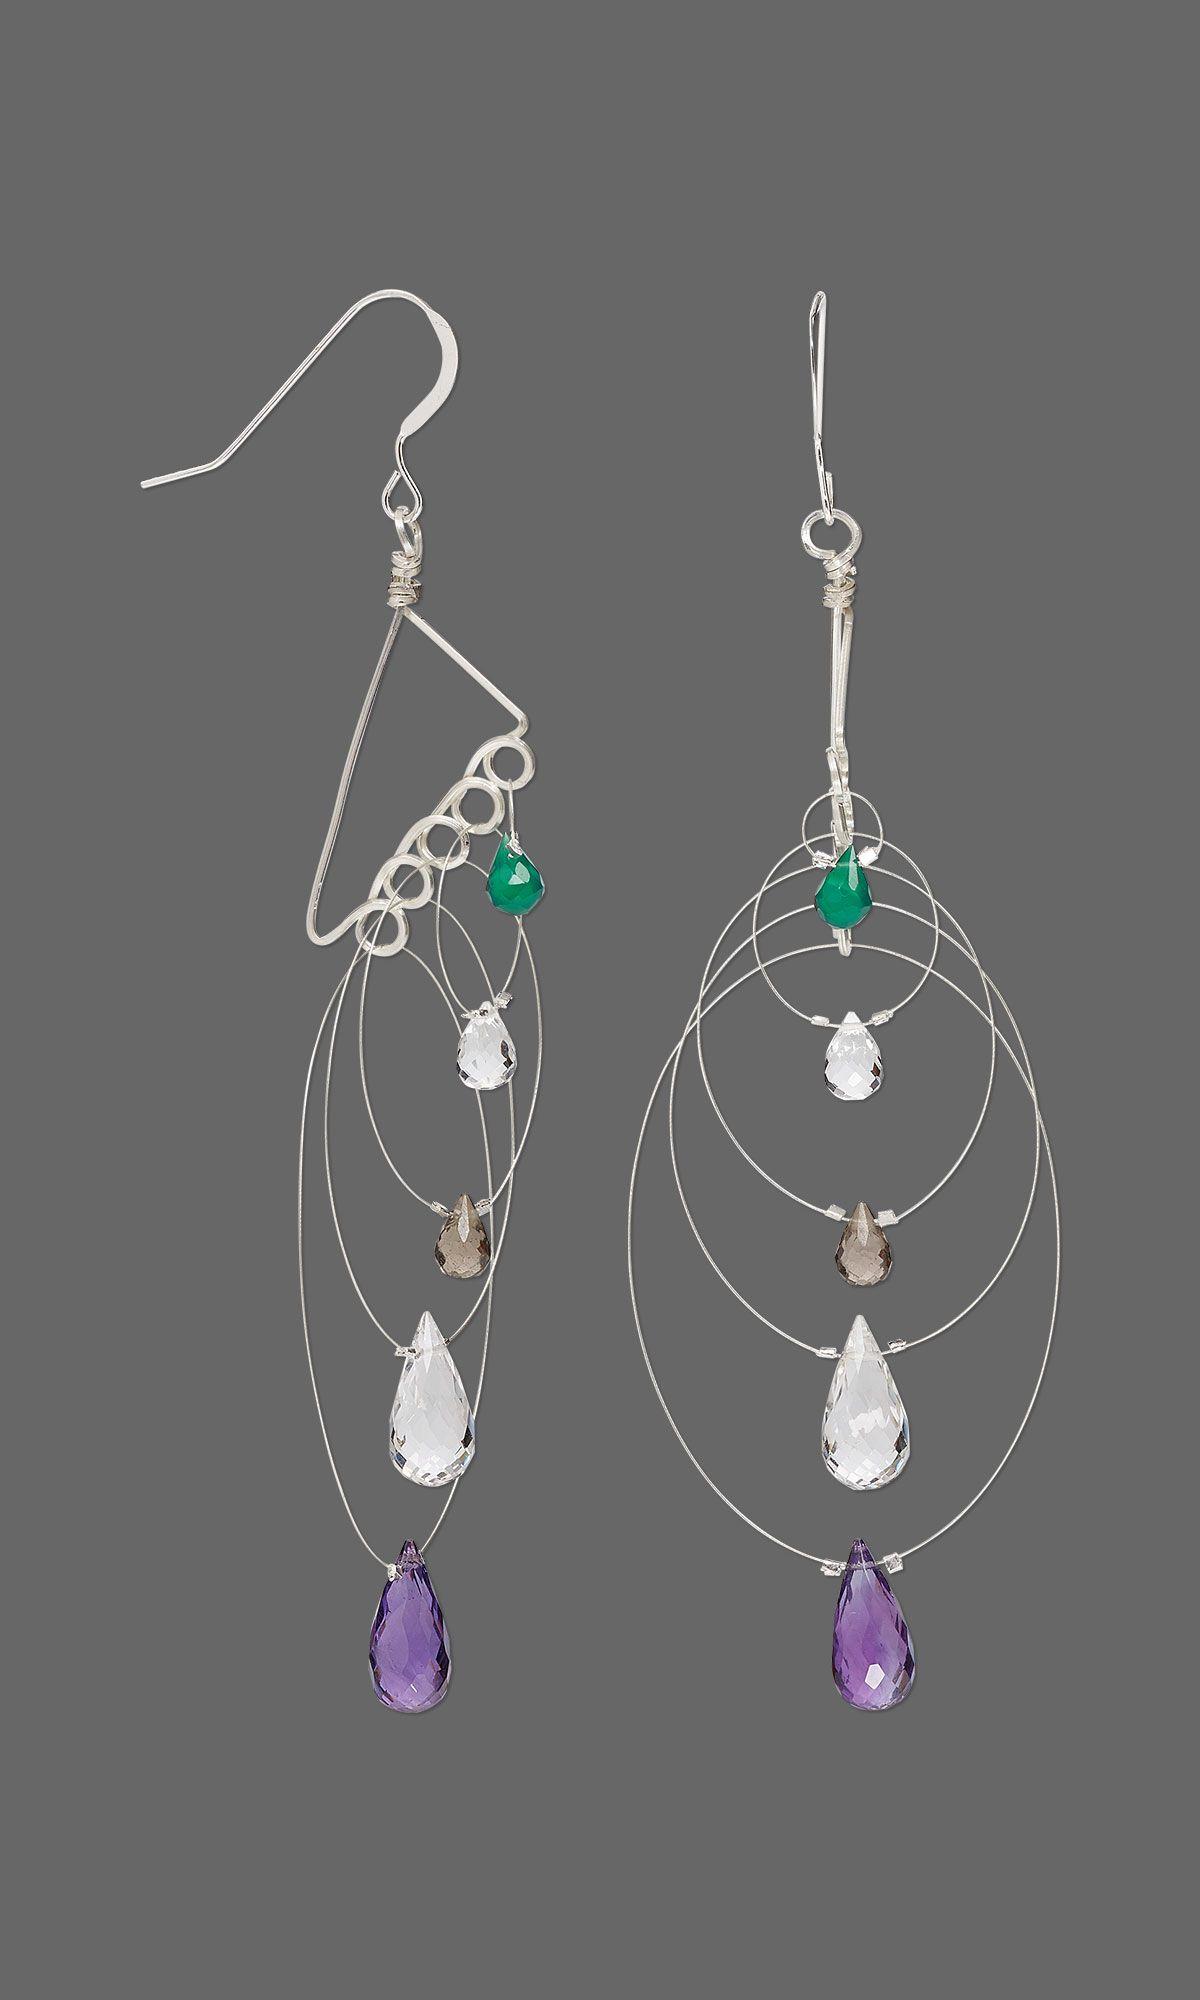 Jewelry Design - Earrings with Gemstone Beads, Accu-Flex® Beading ...